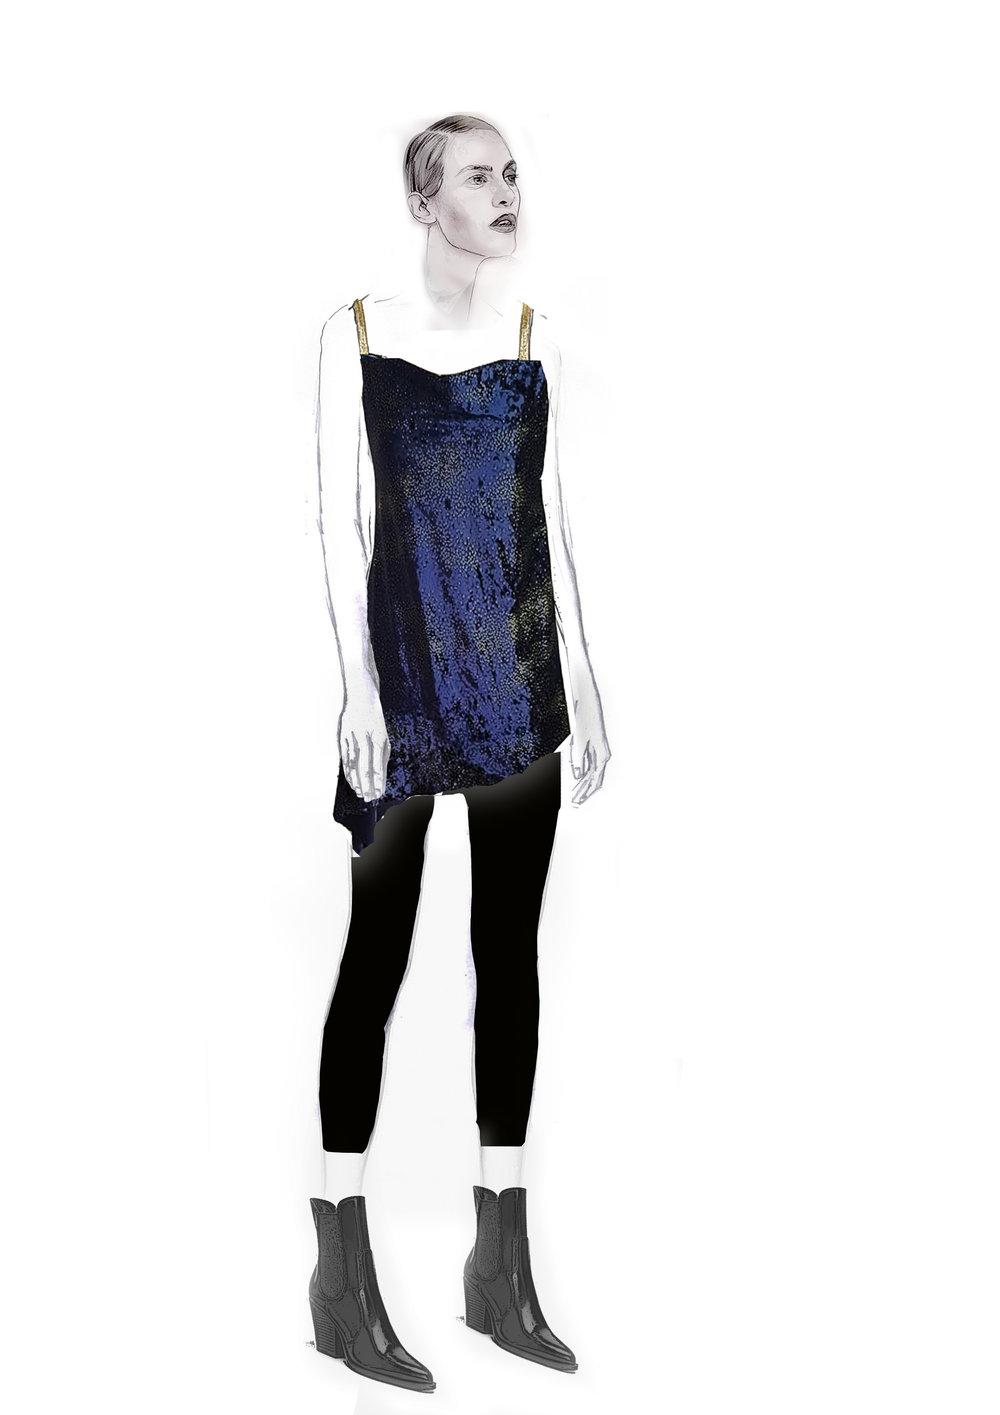 kika final dress top.jpg